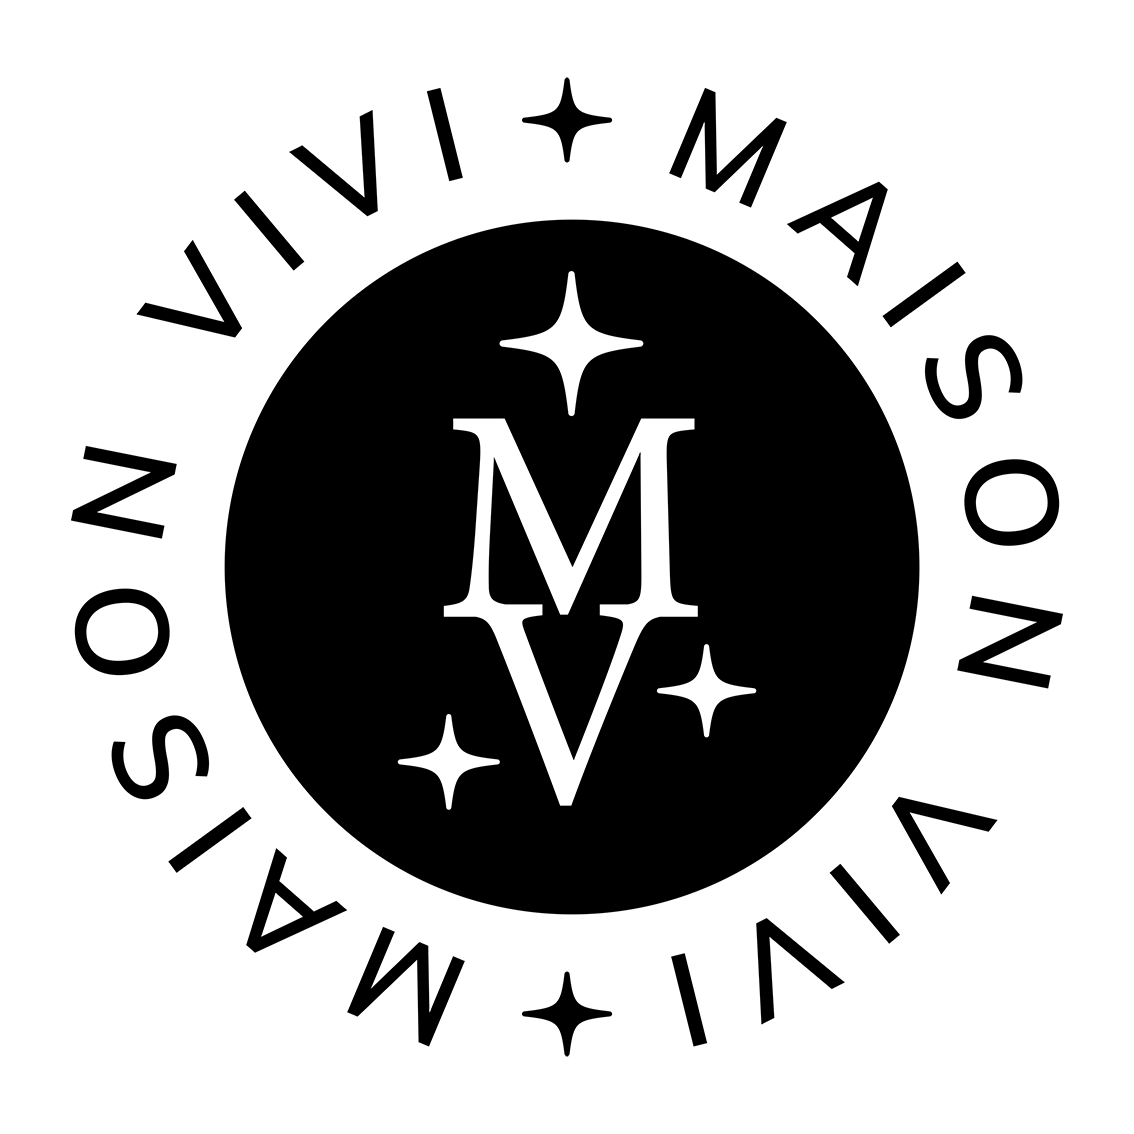 Maison Vivi logo